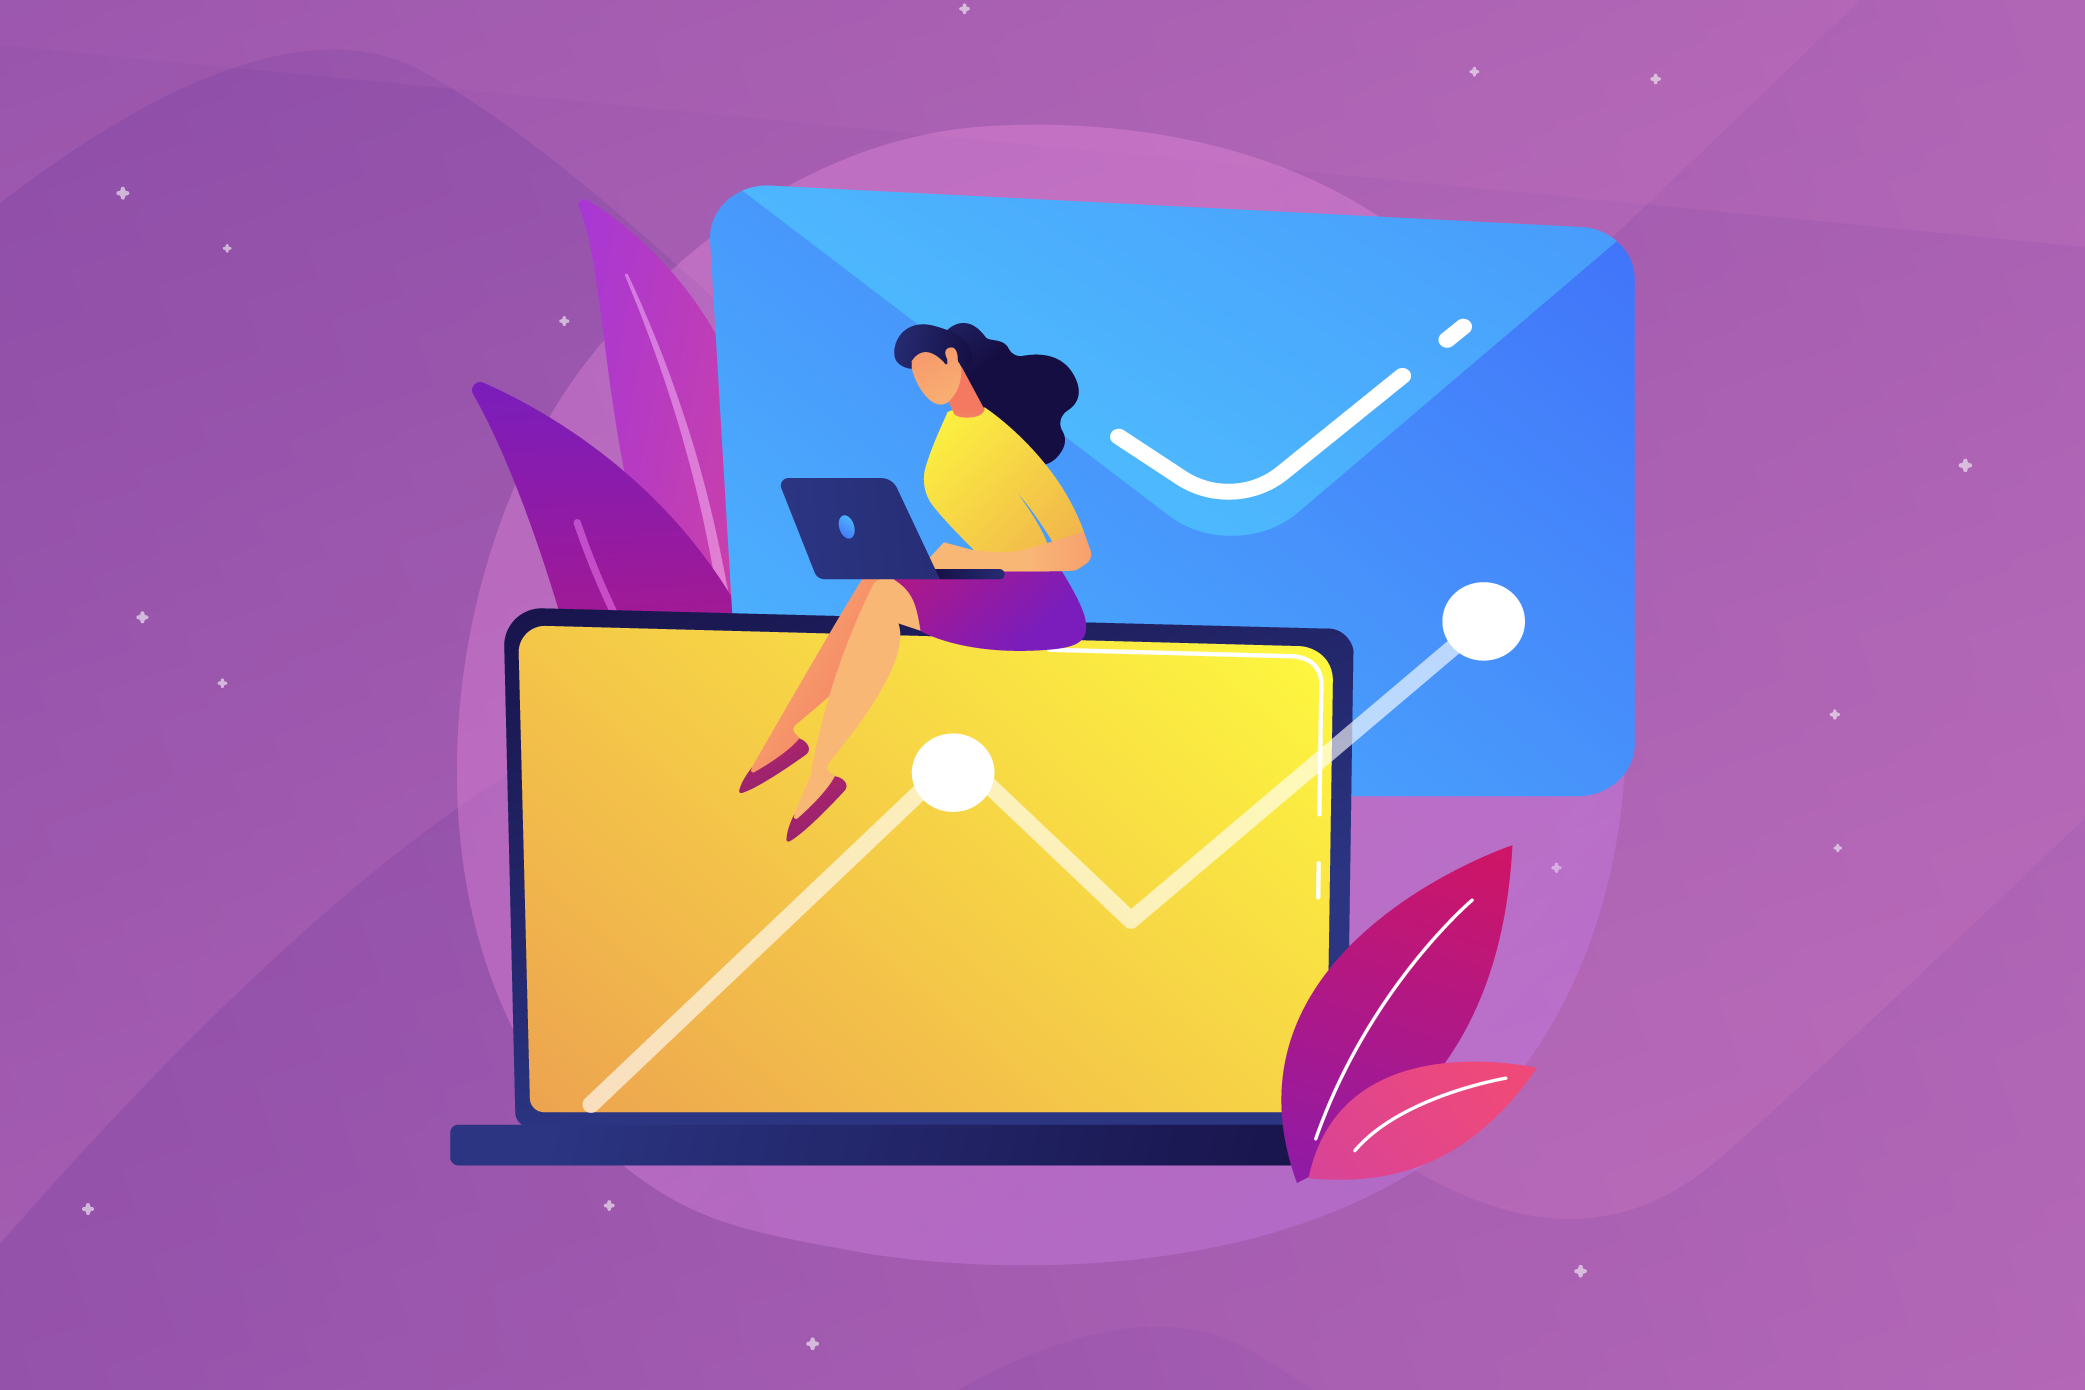 Aumentar taxa de abertura de email